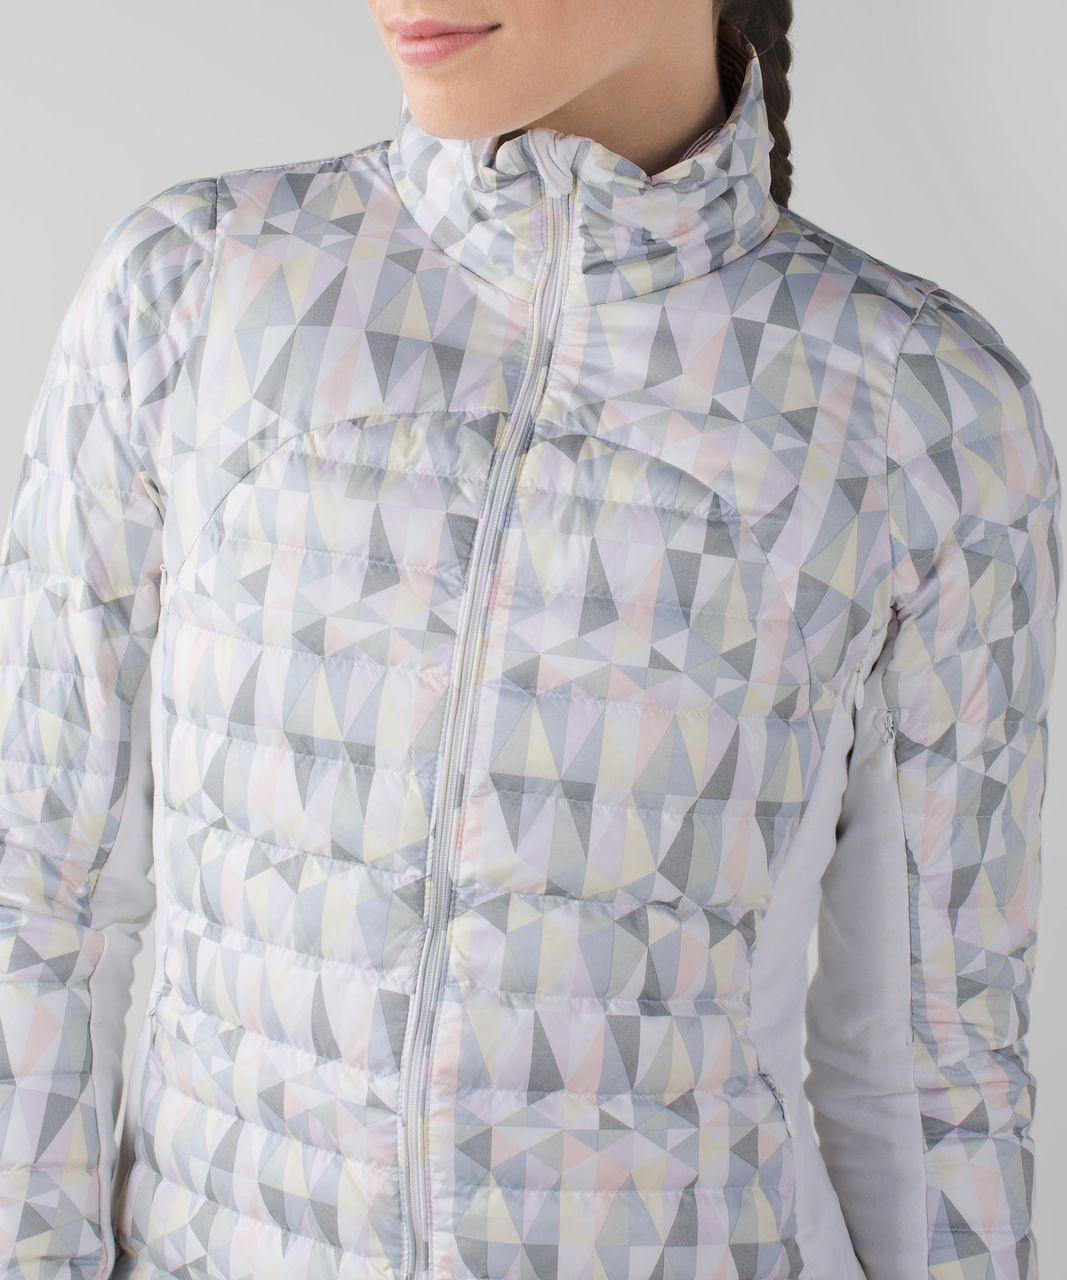 Lululemon Fluff Off Jacket - Stained Glass Love White Neutral Blush / Tonka Stripe Heathered Slate White